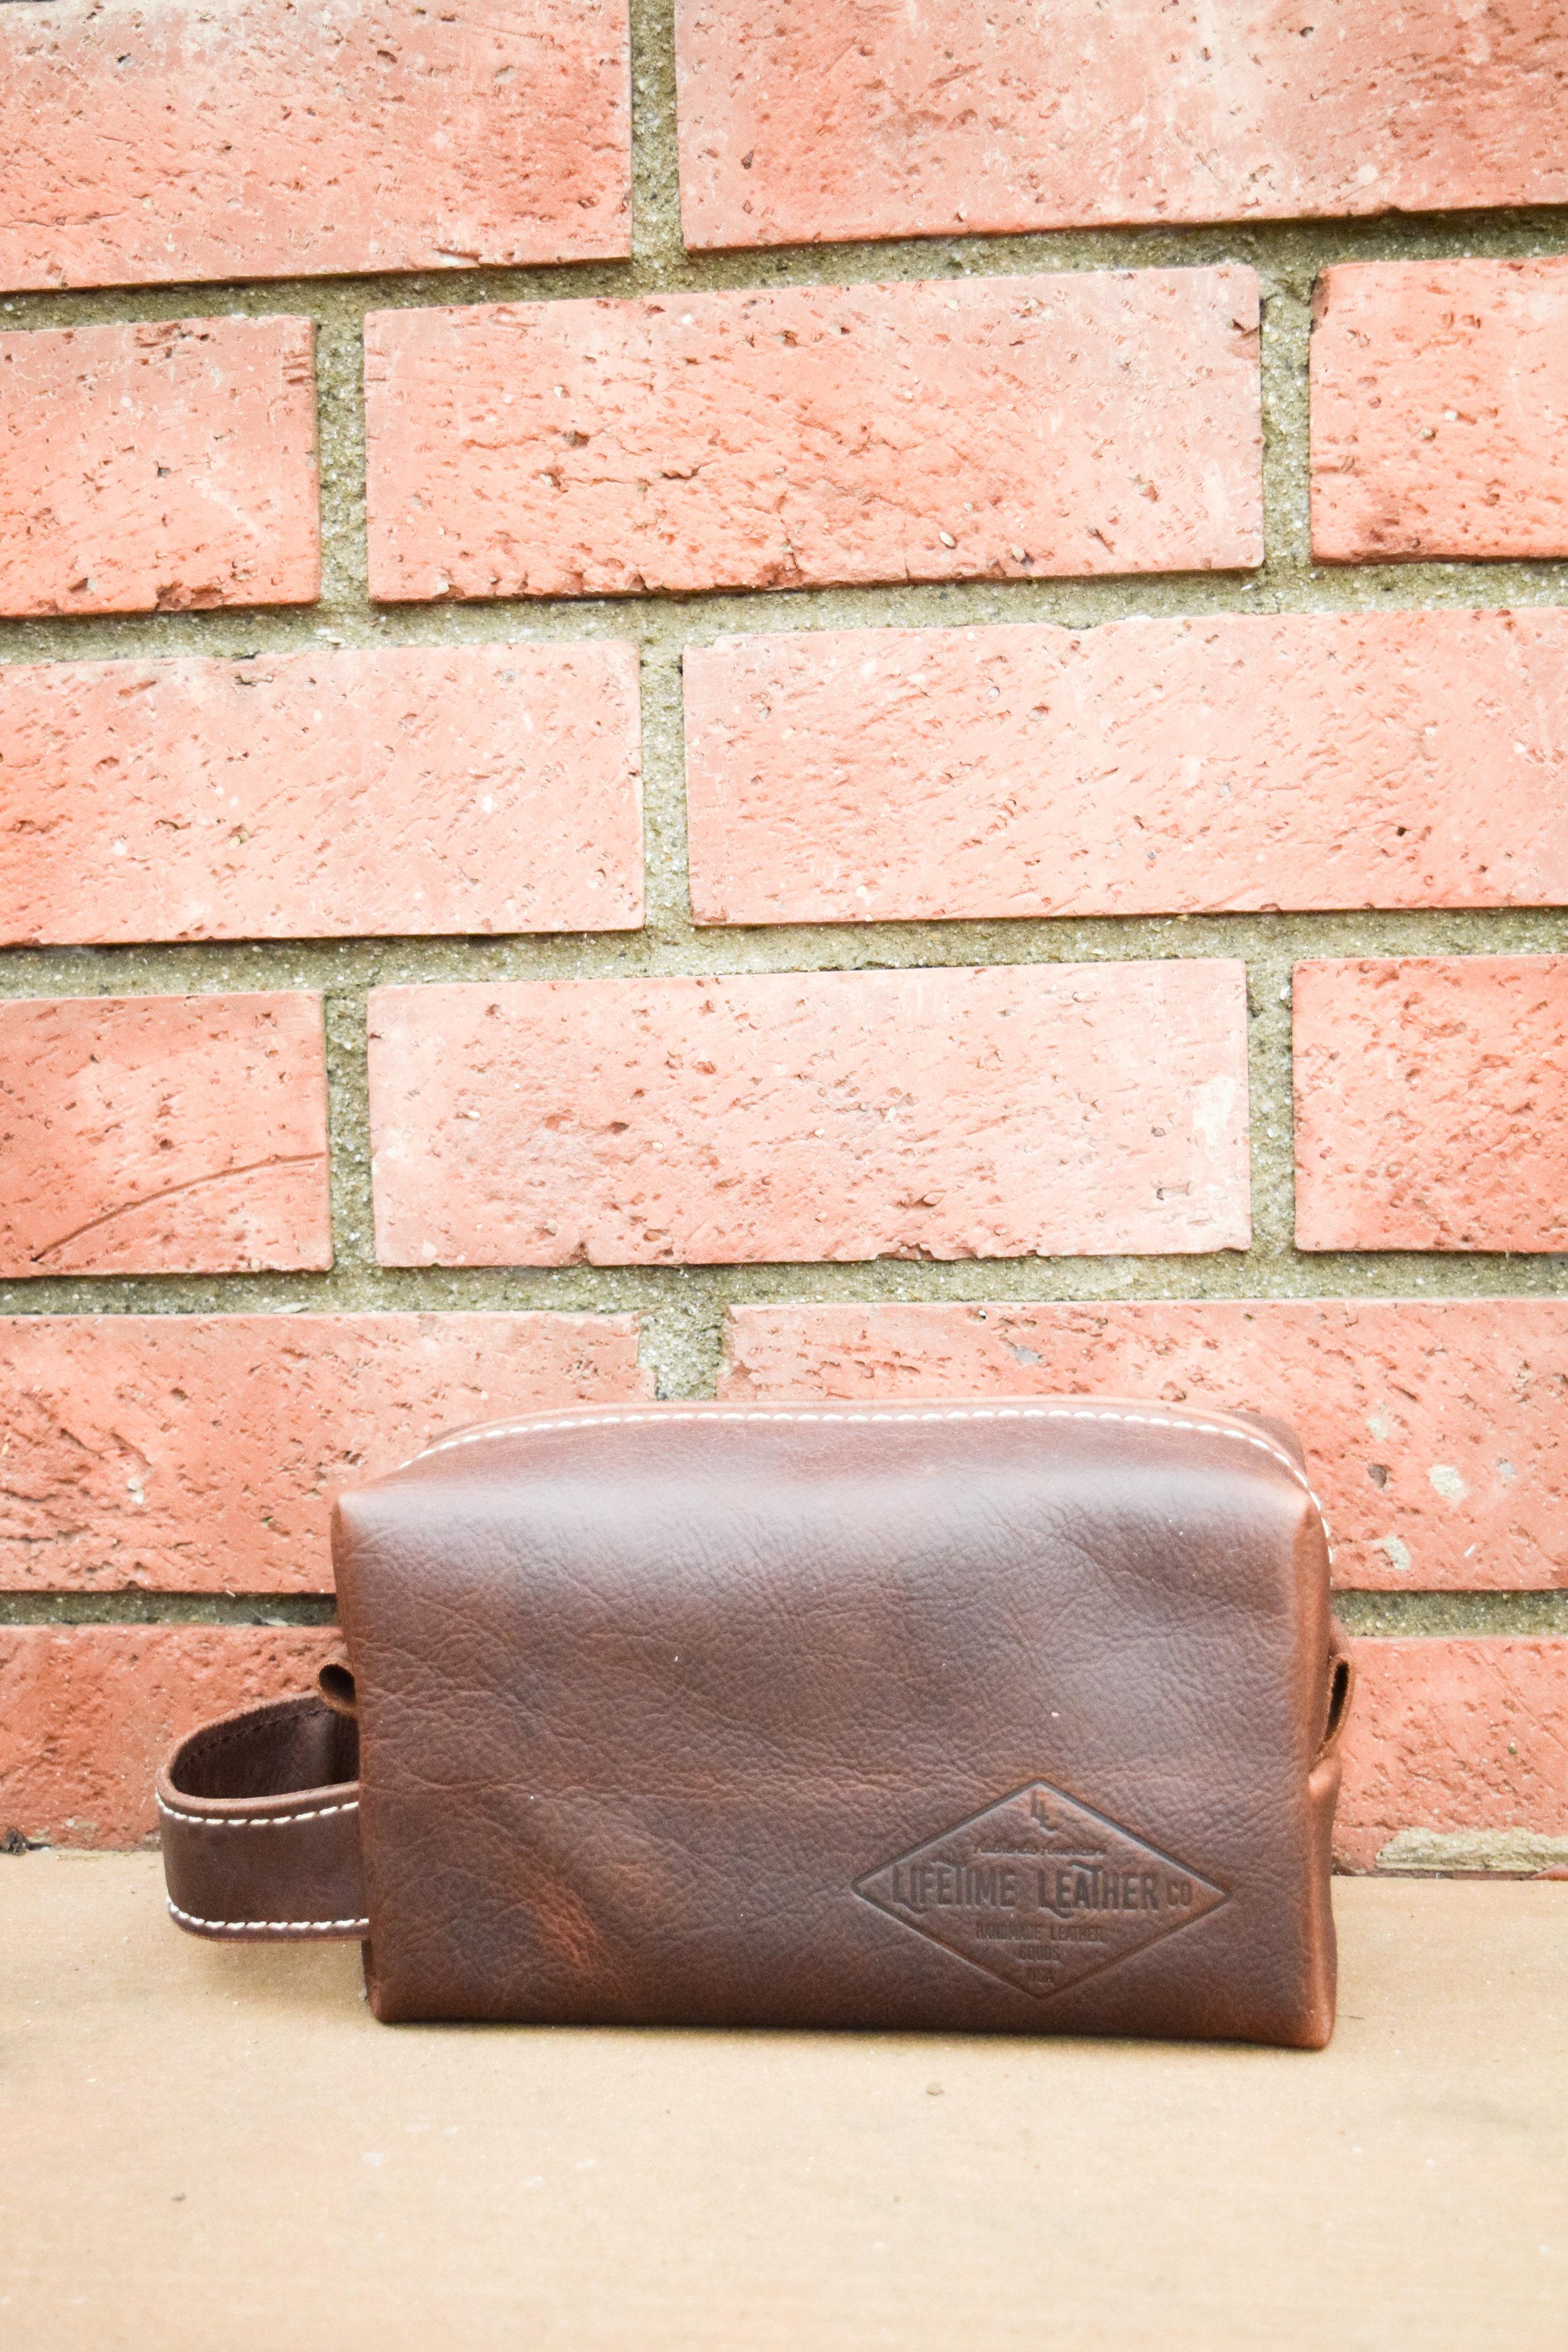 Practical Groomsman Gift Idea - Men's Leather Toiletry Bag - Lifetime Leather Co